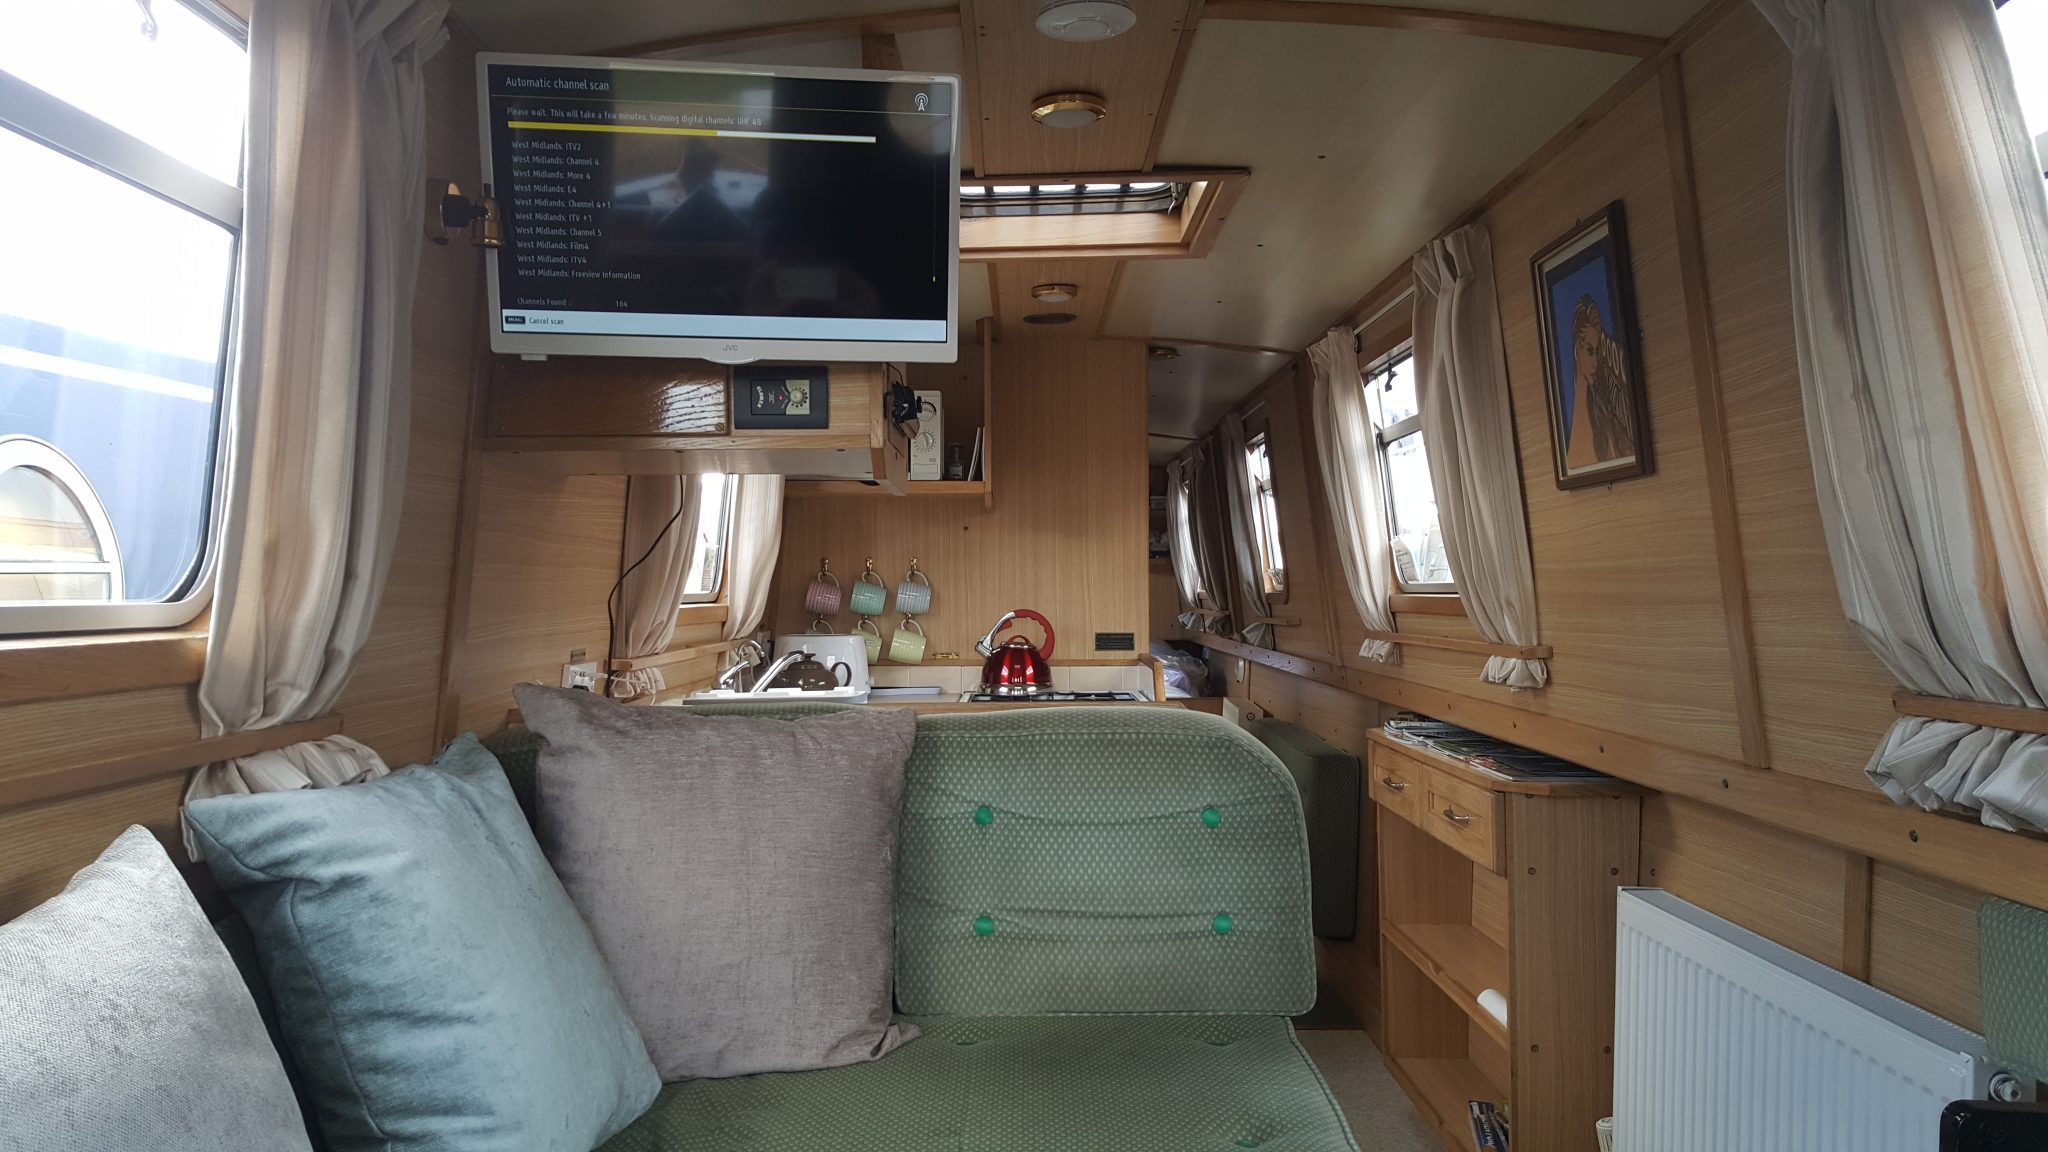 Inside the Midland Mallard Narrowboat